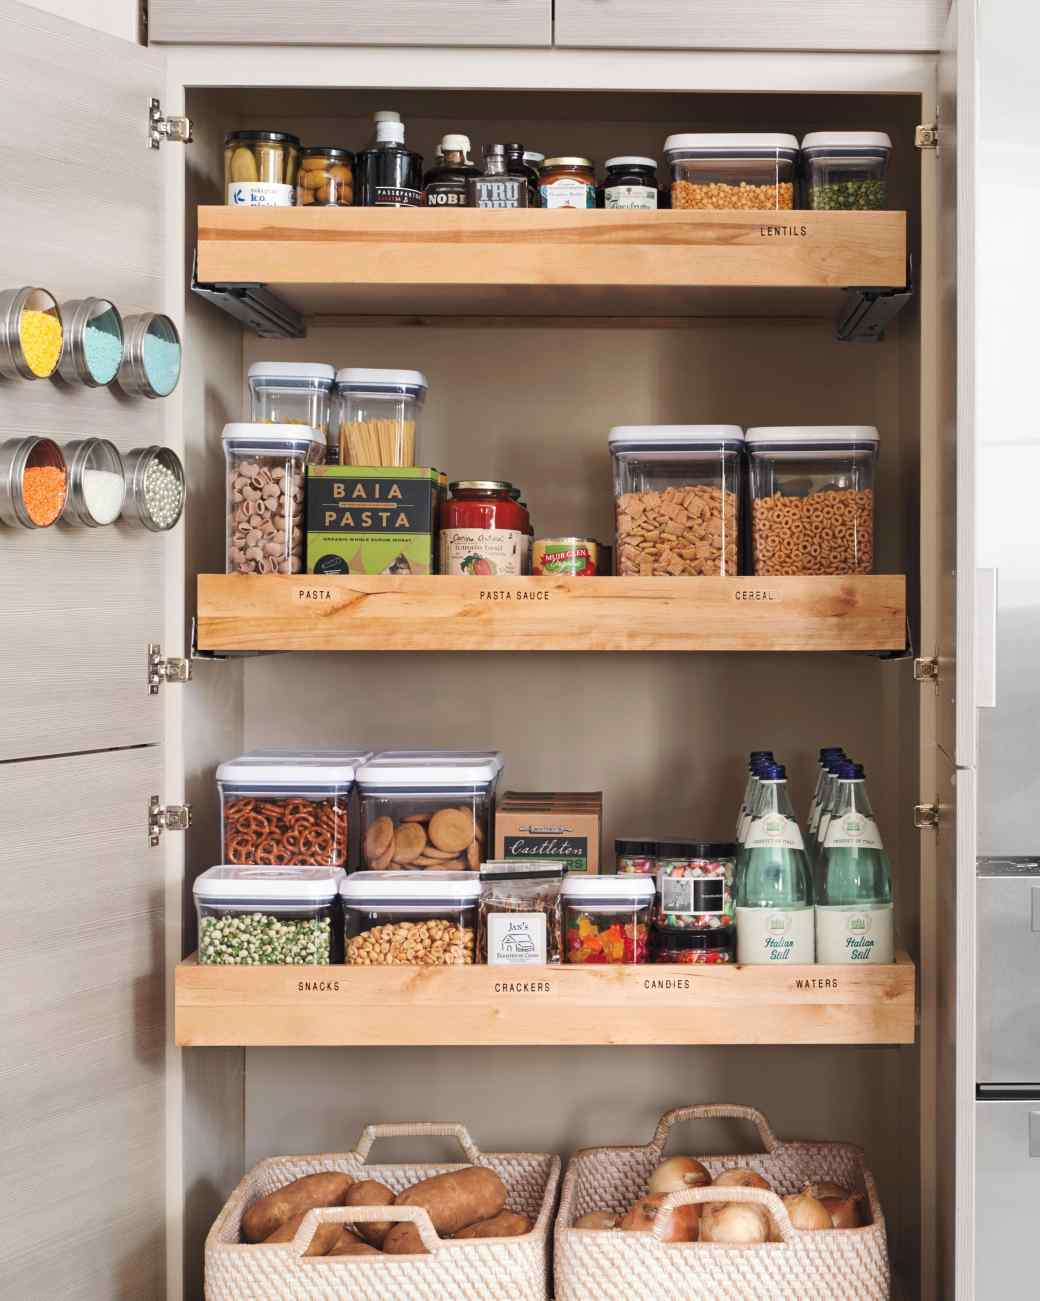 Dise Os De Cocinas Peque As Que Querr S Para La Tuya Estreno Casa # Muebles Sin Pintar